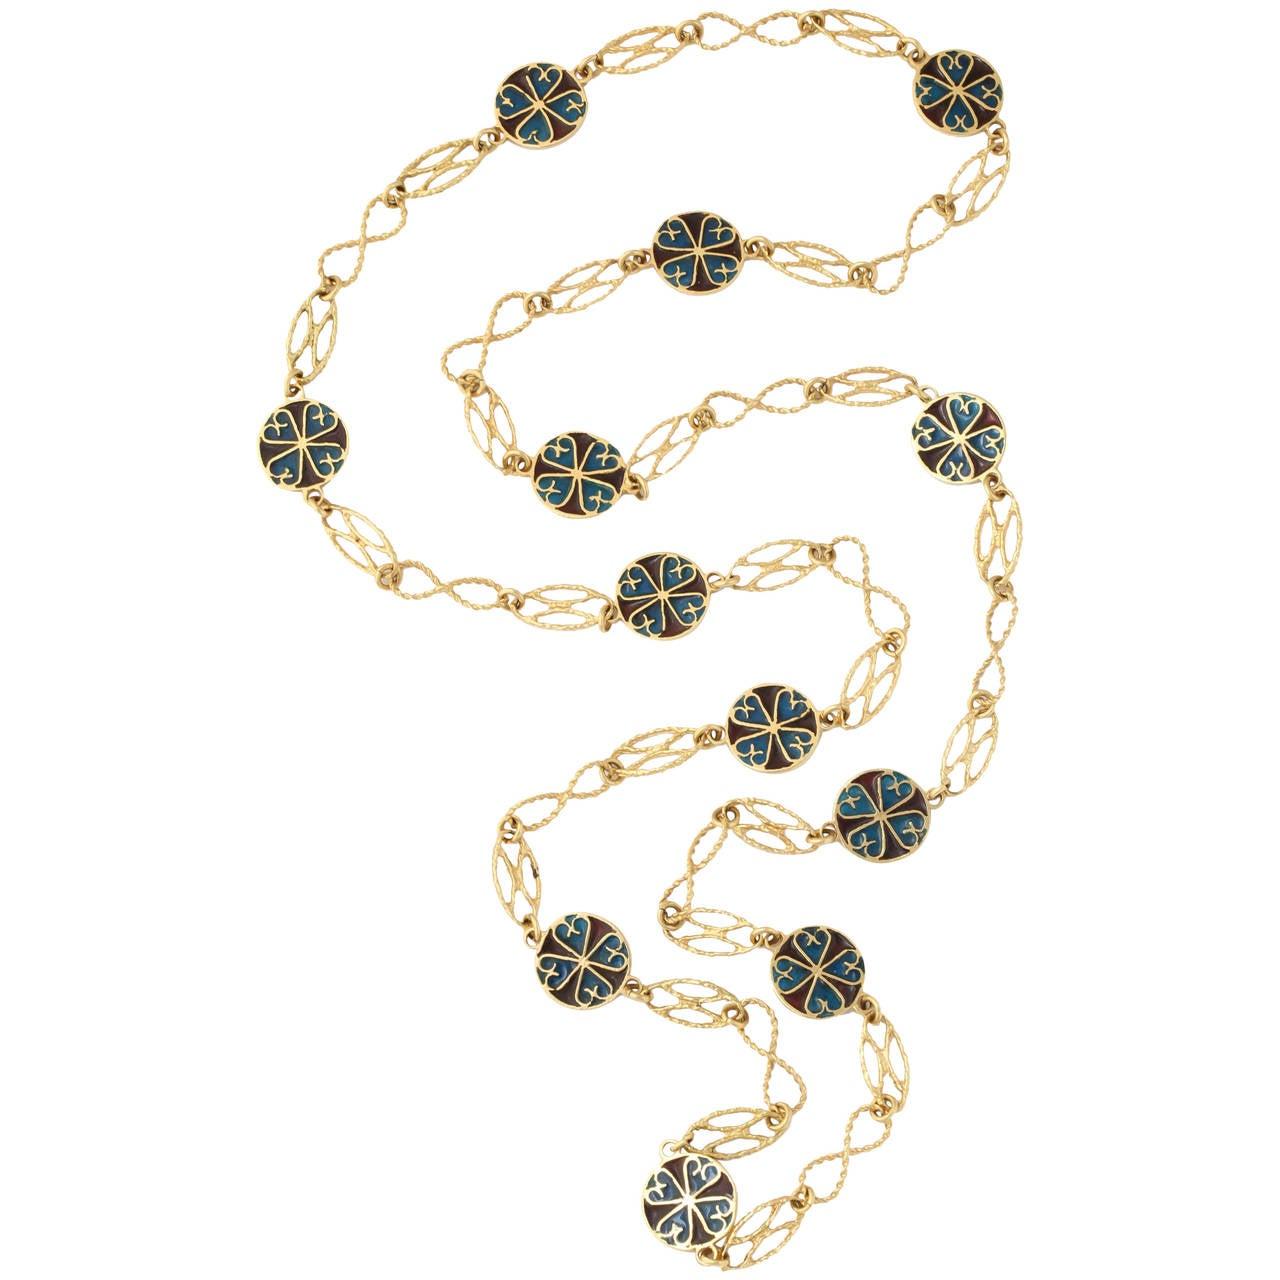 1950s Elegant Plique-A-Jour Enamel and Open Link Gold Slip On Chain